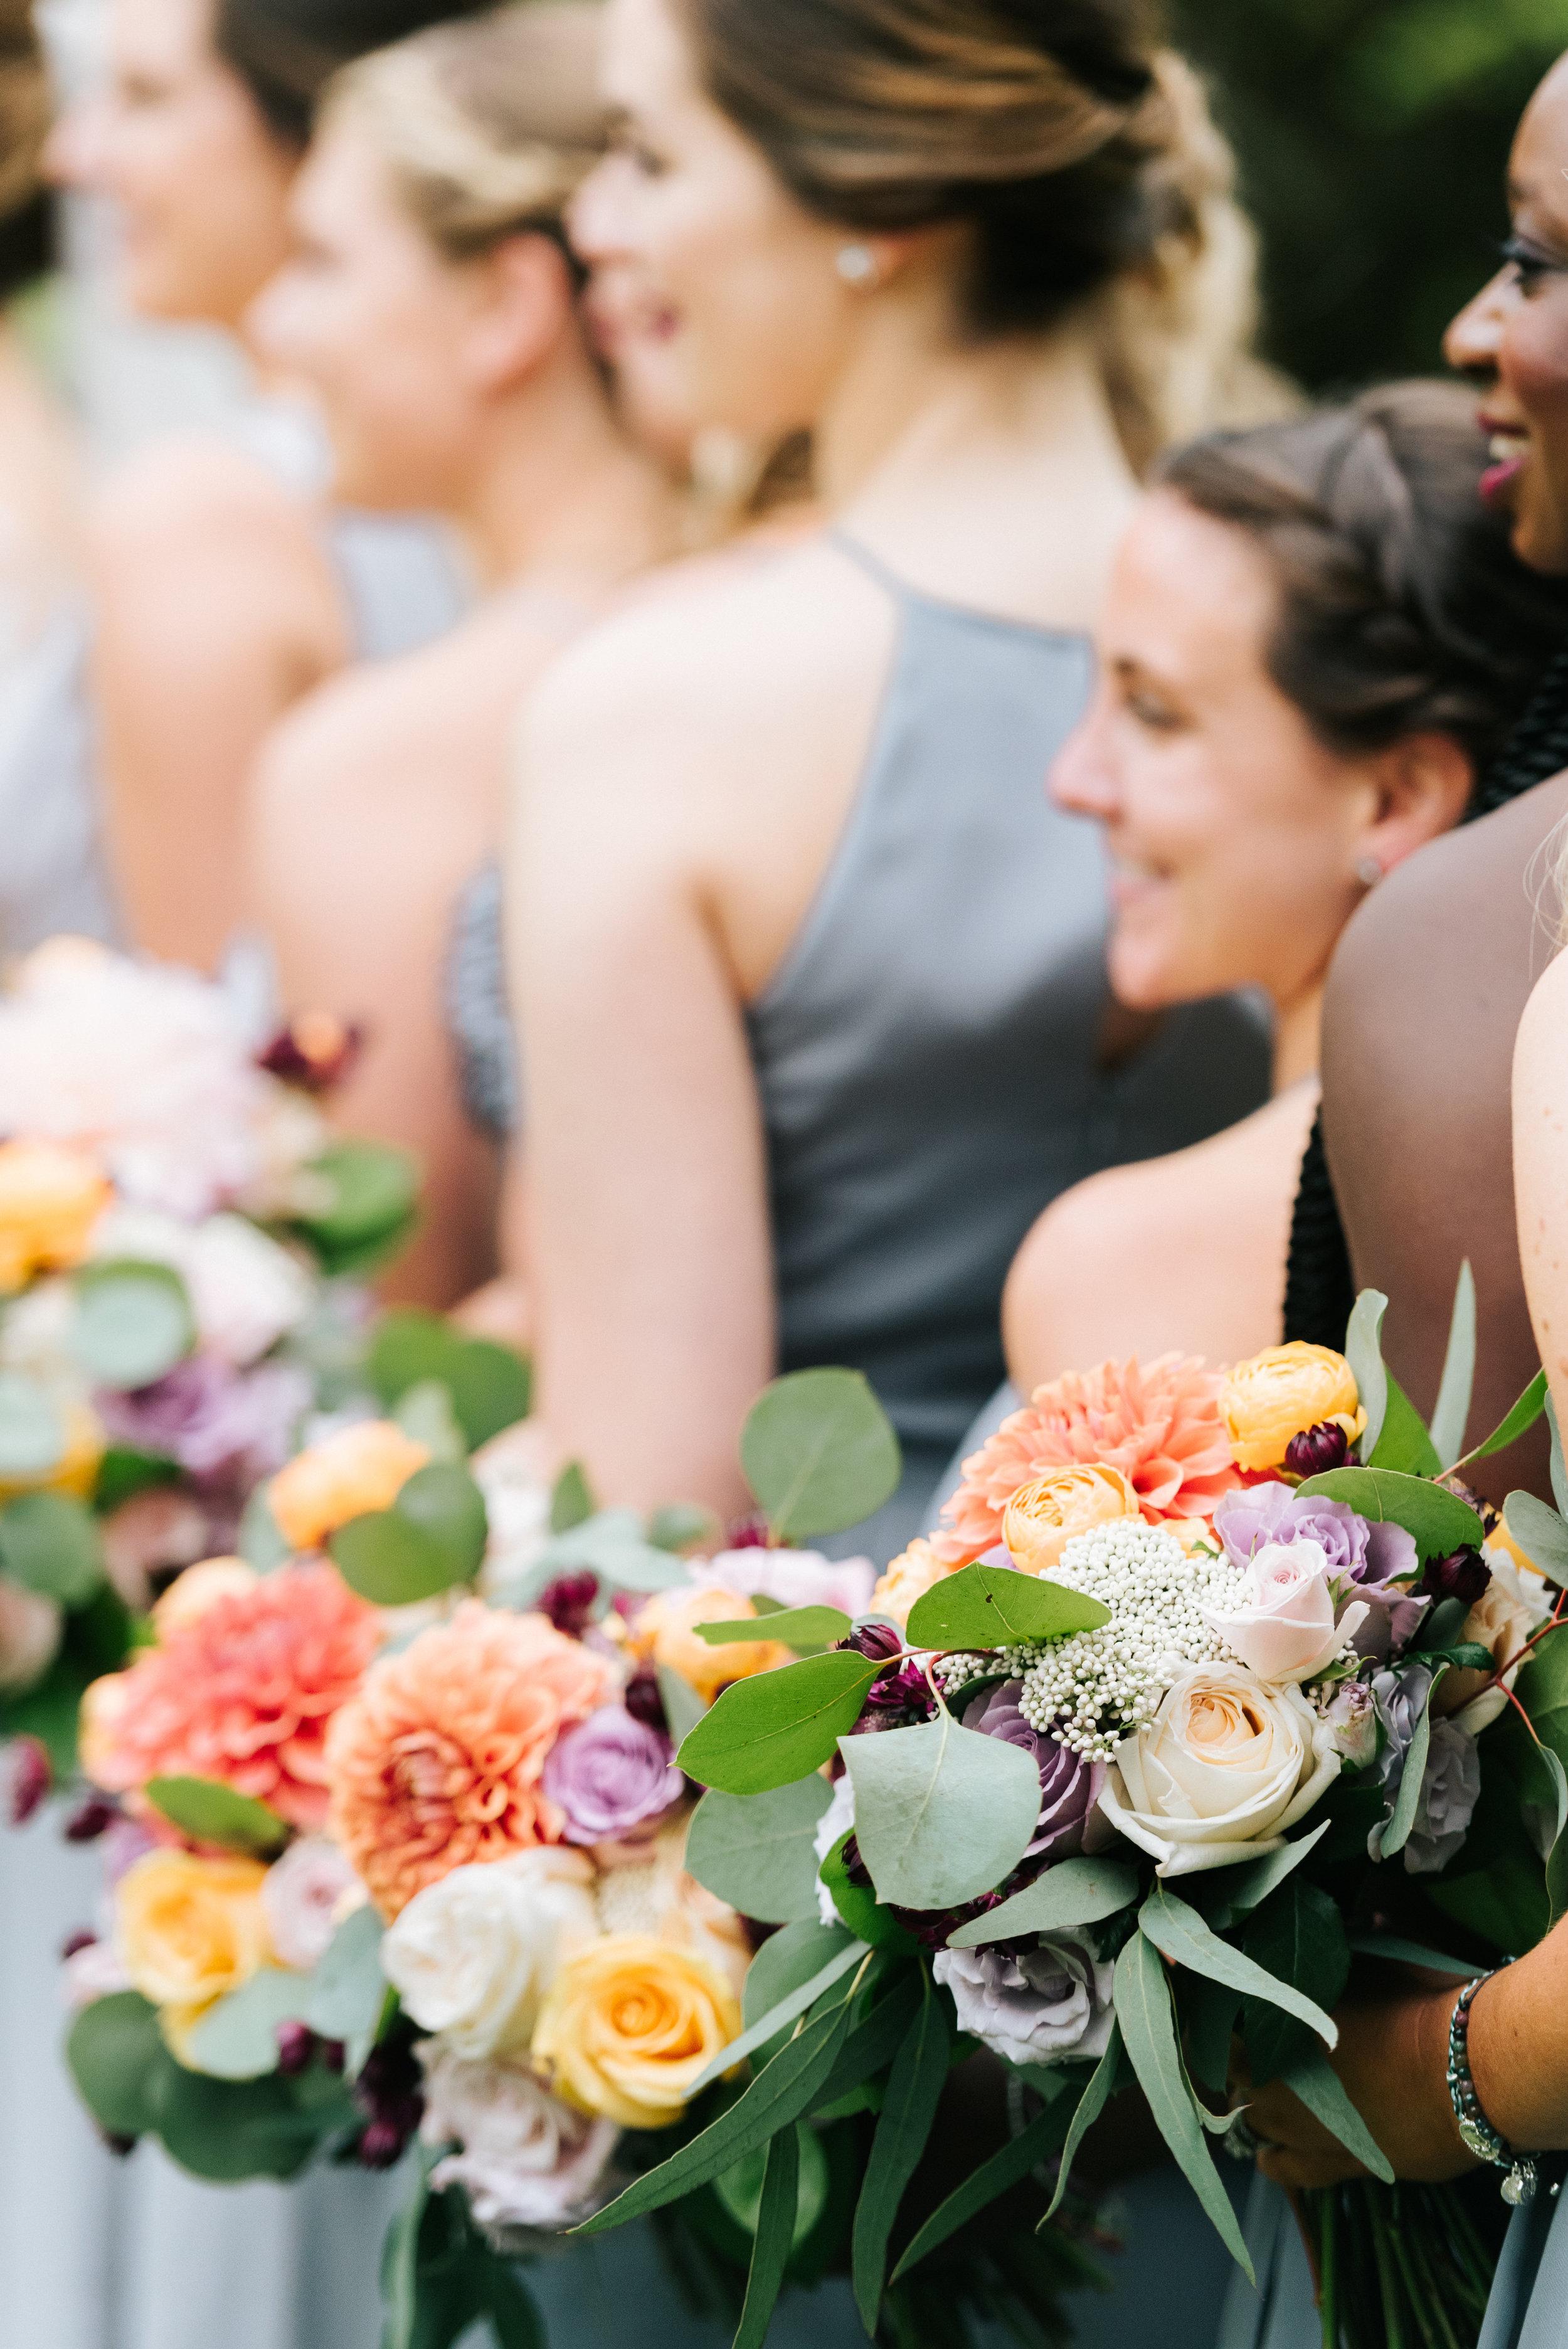 nicoleandjakeannarborwedding-441.jpg